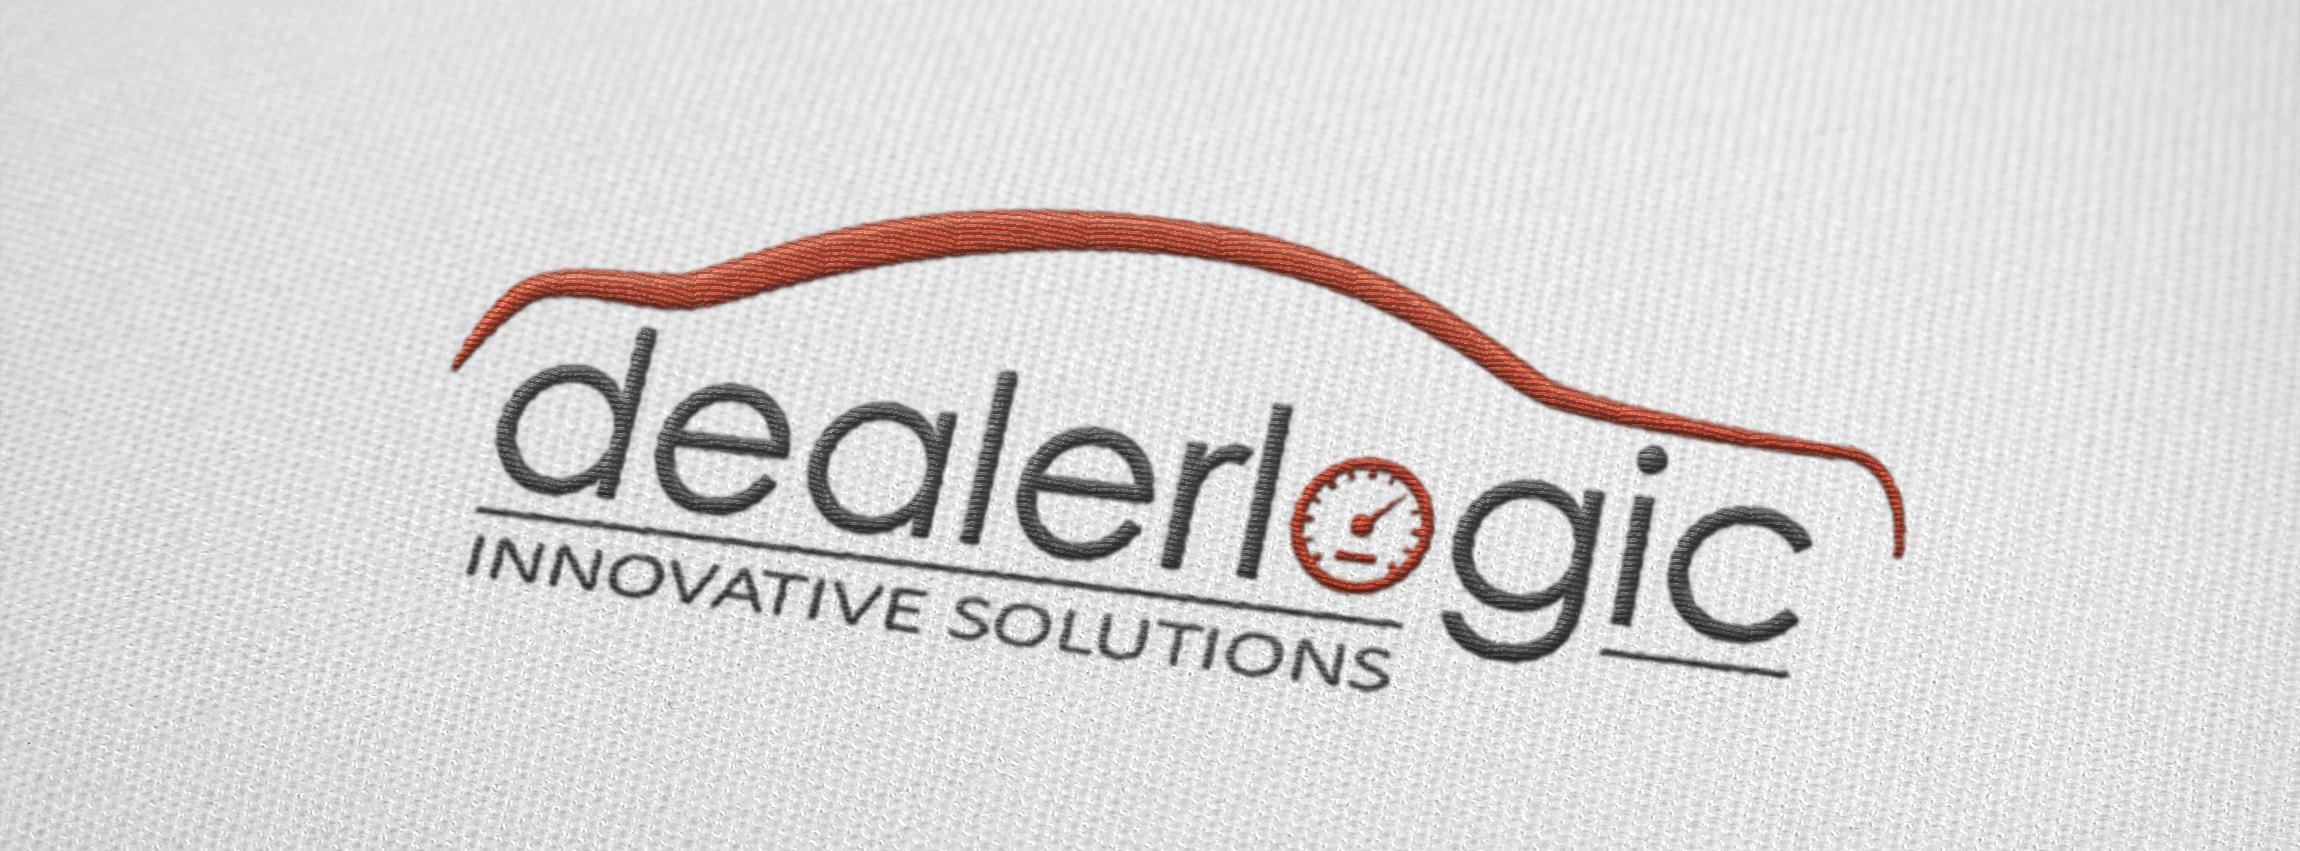 Dealerlogic Logo